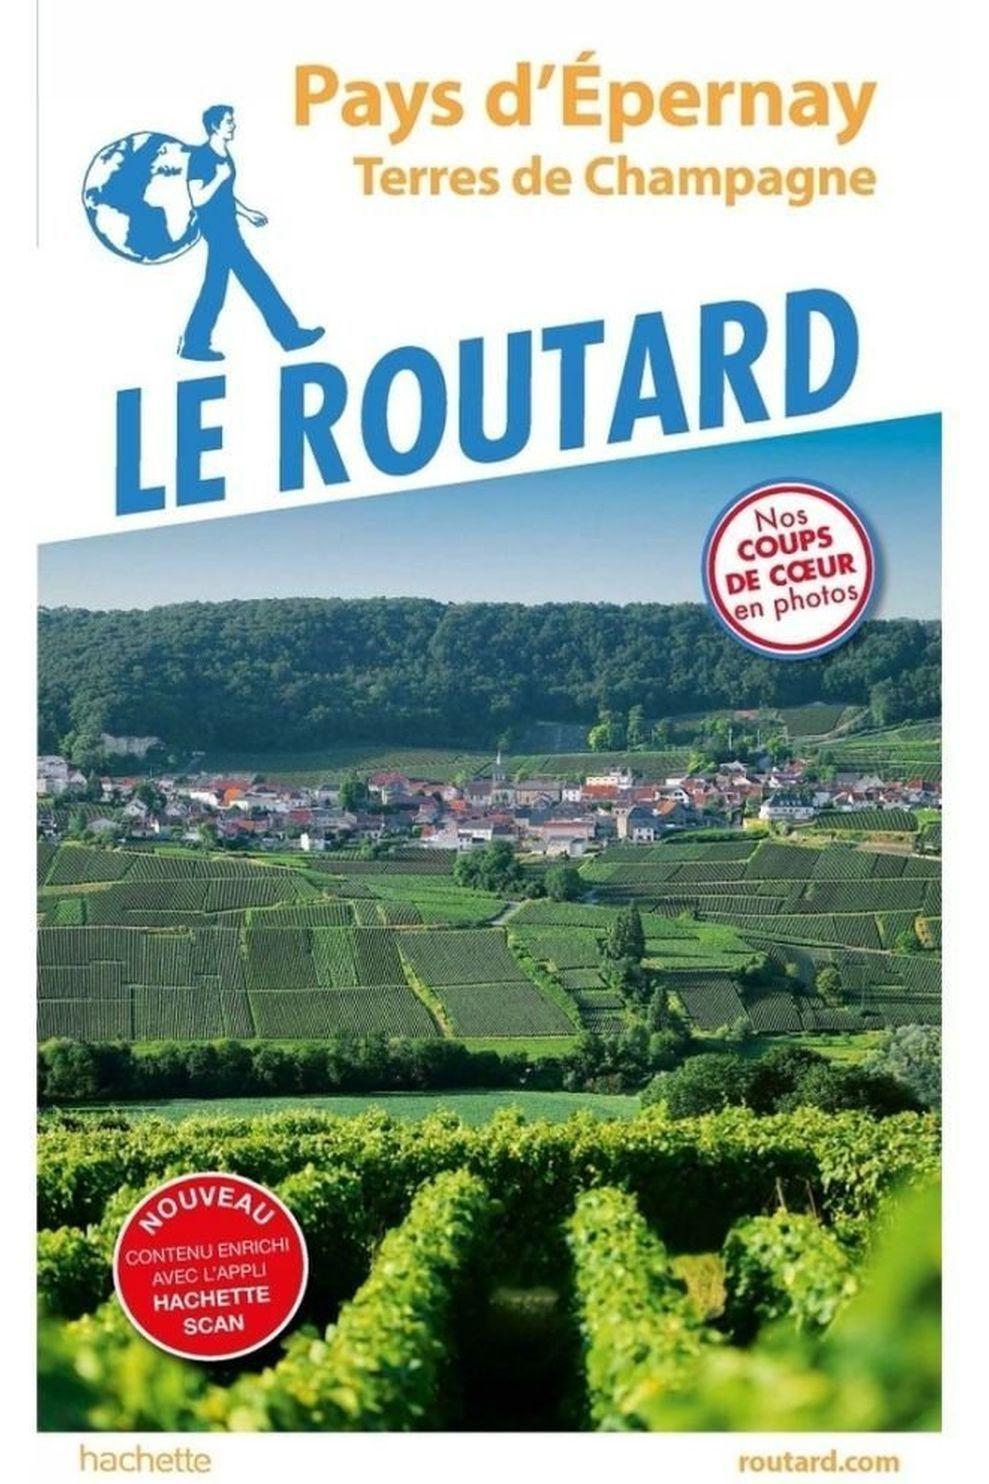 Routard Boek Rout Rout.Rfp045 - 2019